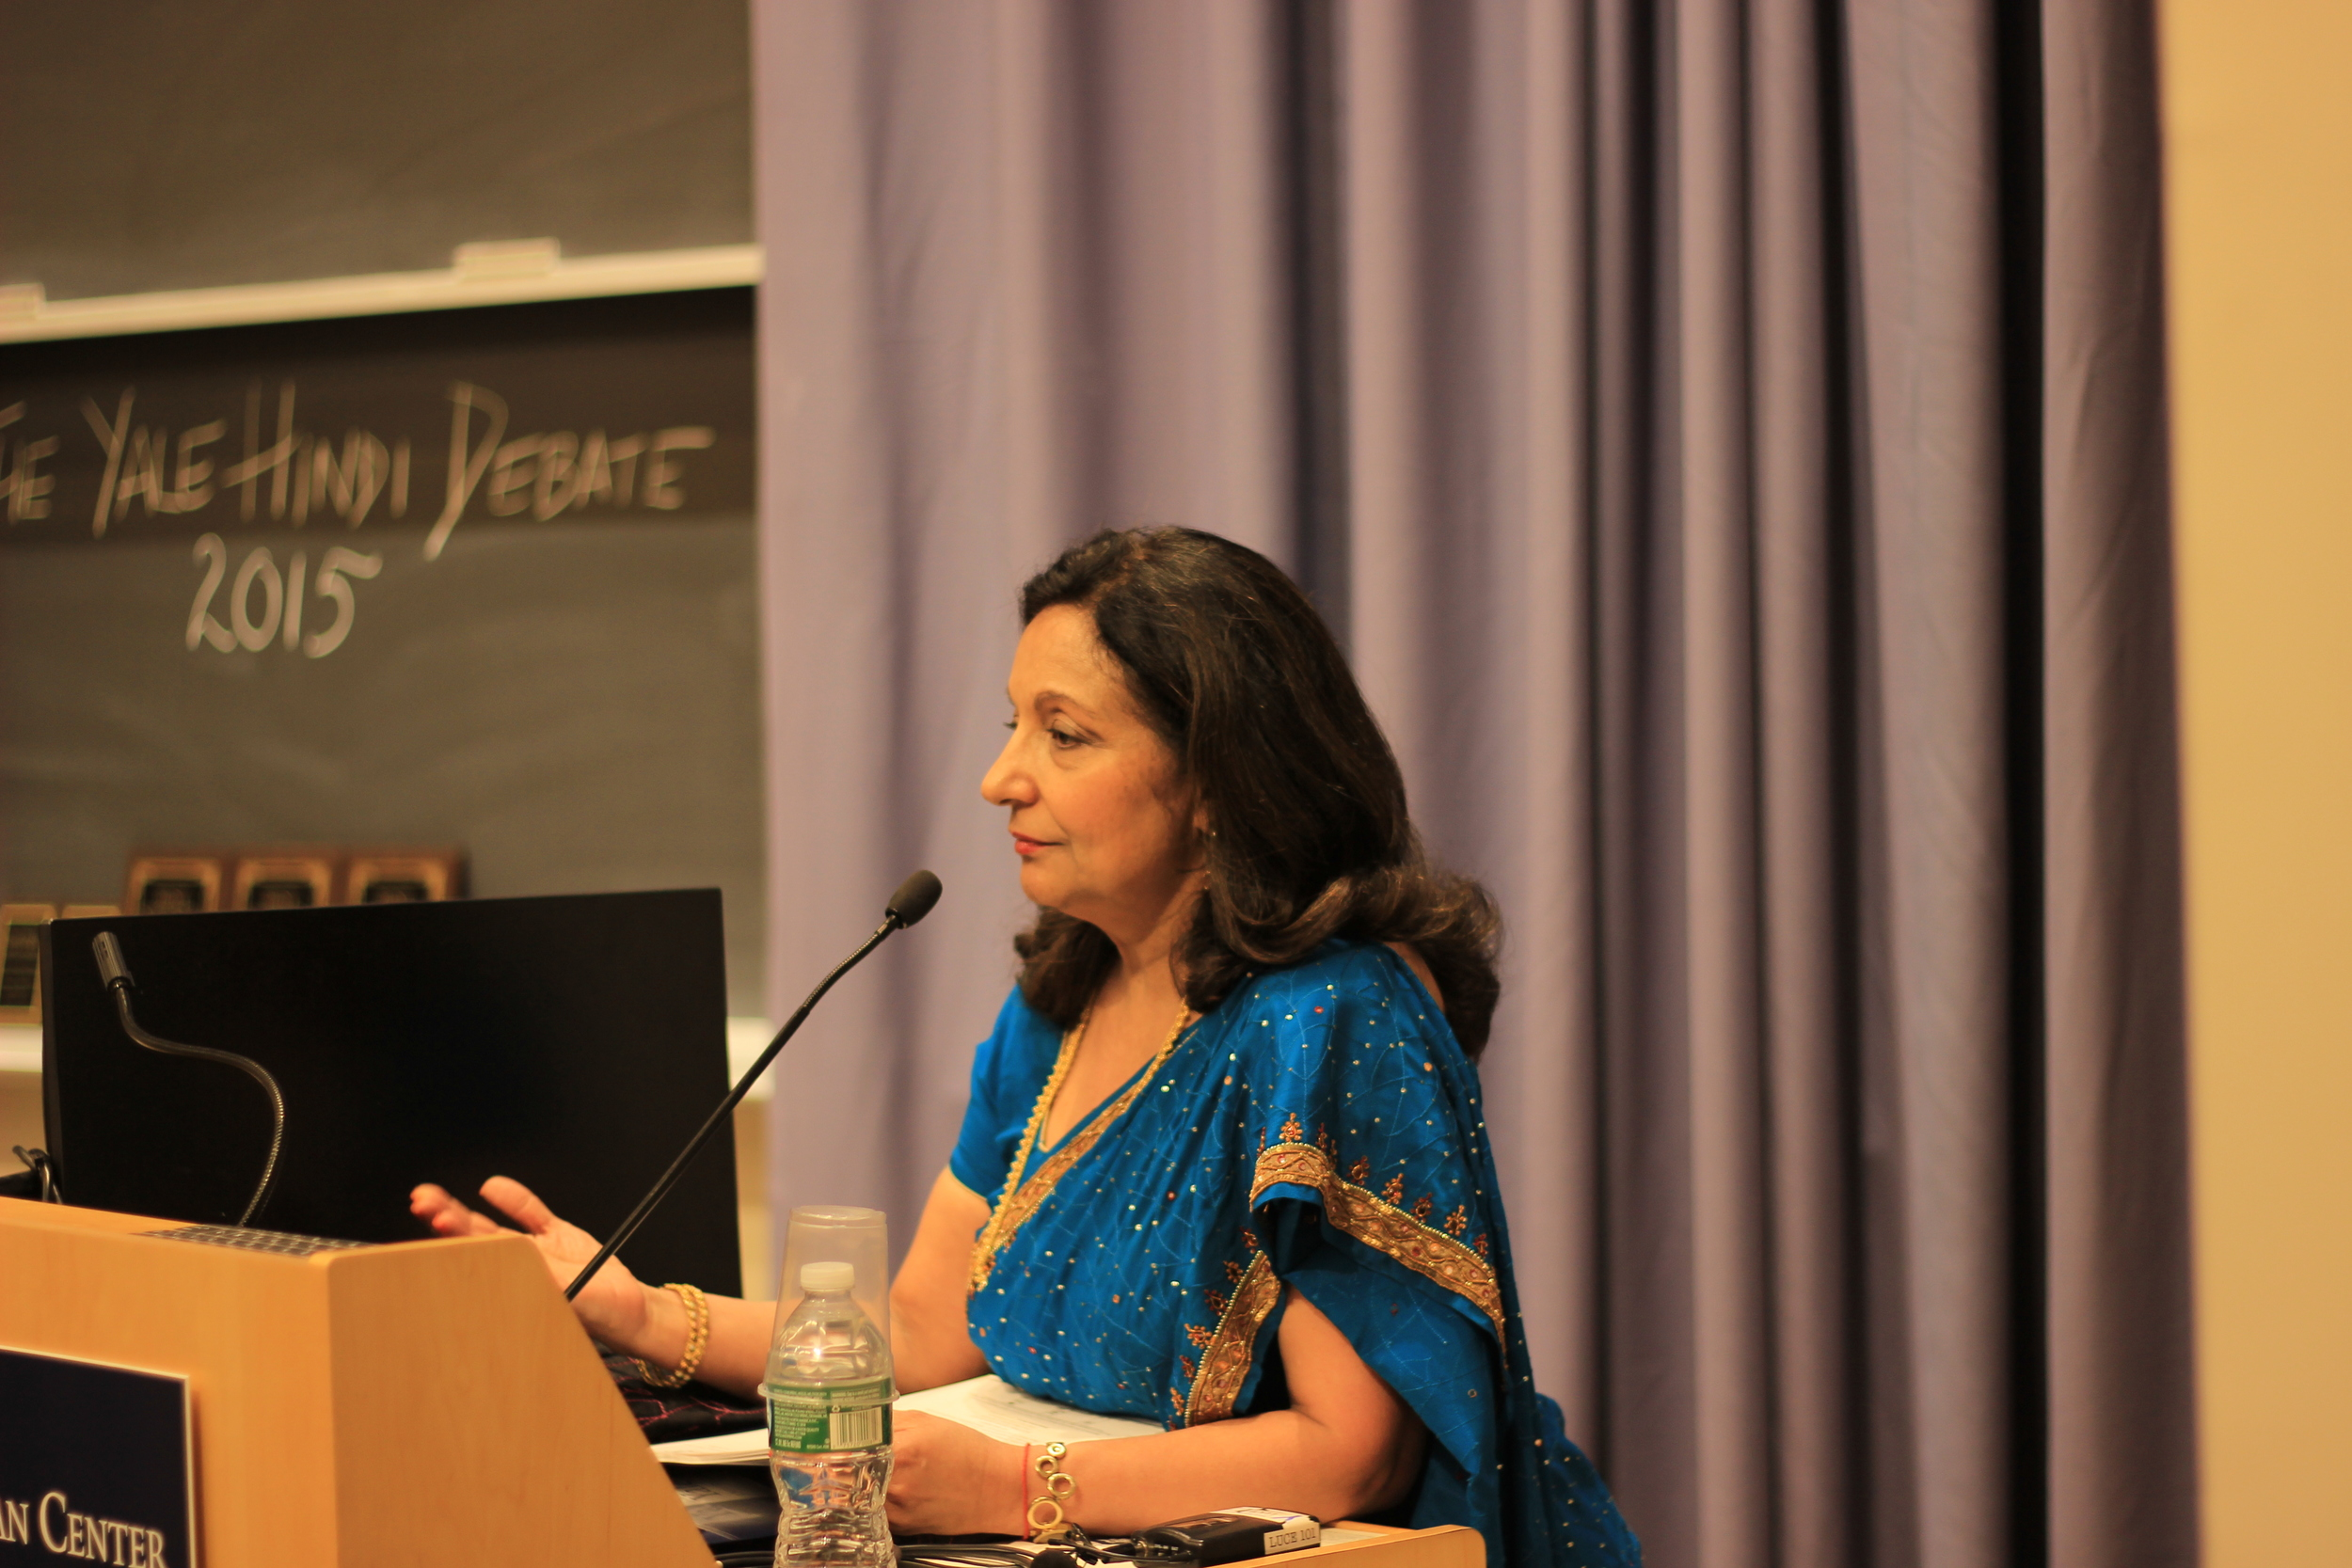 Professor Seema Khurana, Senior Lector, SASC, Yale University; YHD Faculty Co-ordinator